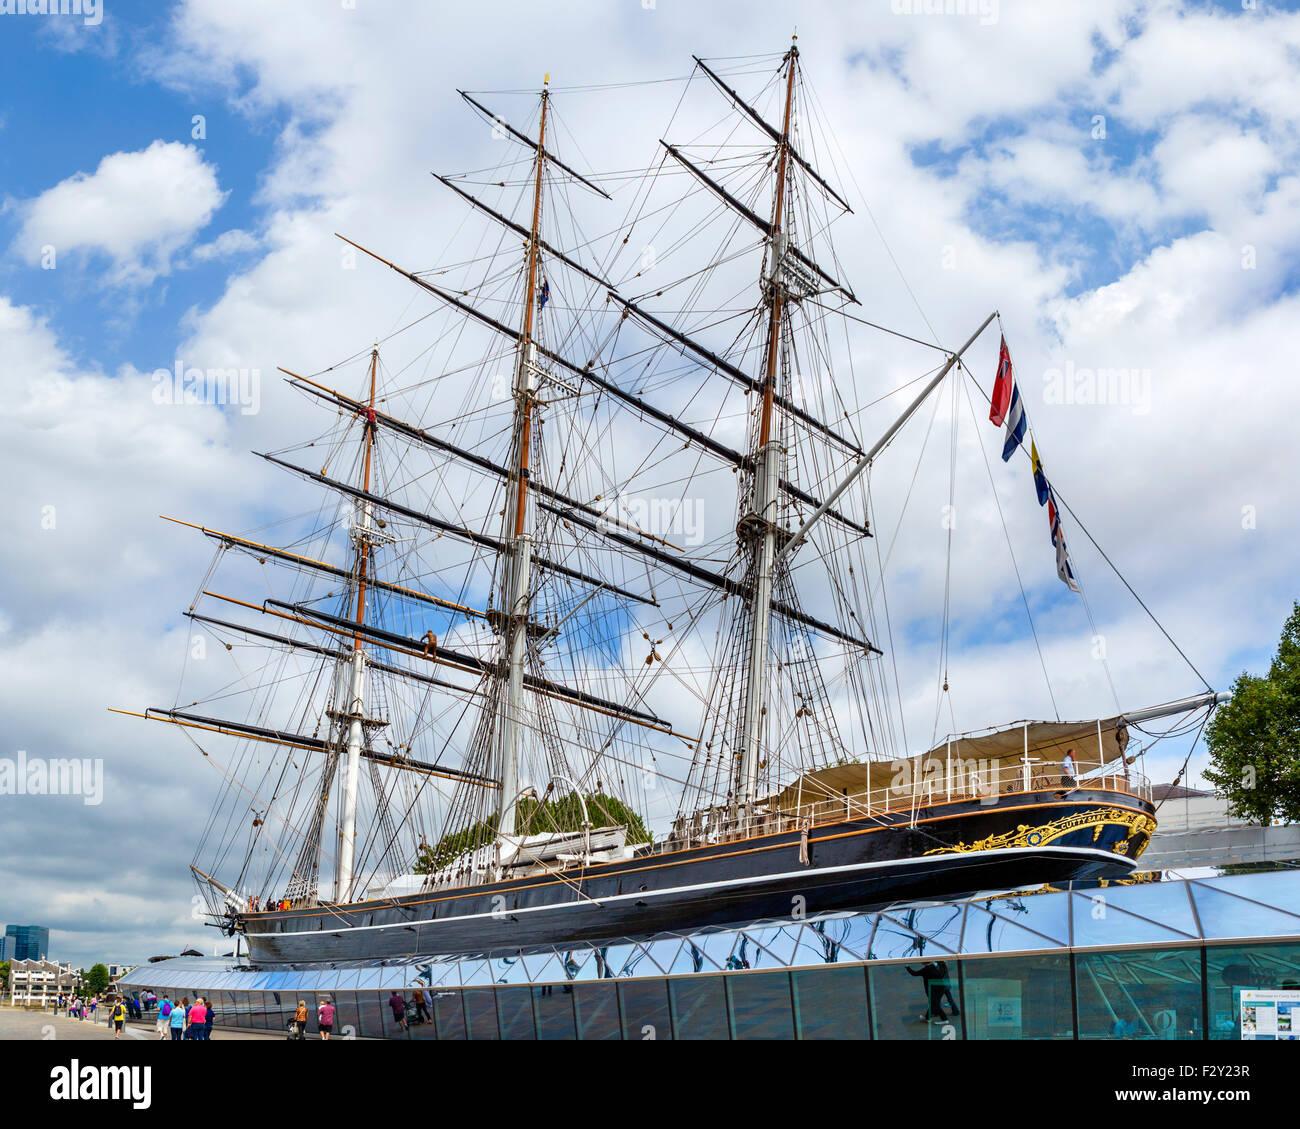 The Cutty Sark, Greenwich, London, England, UK - Stock Image